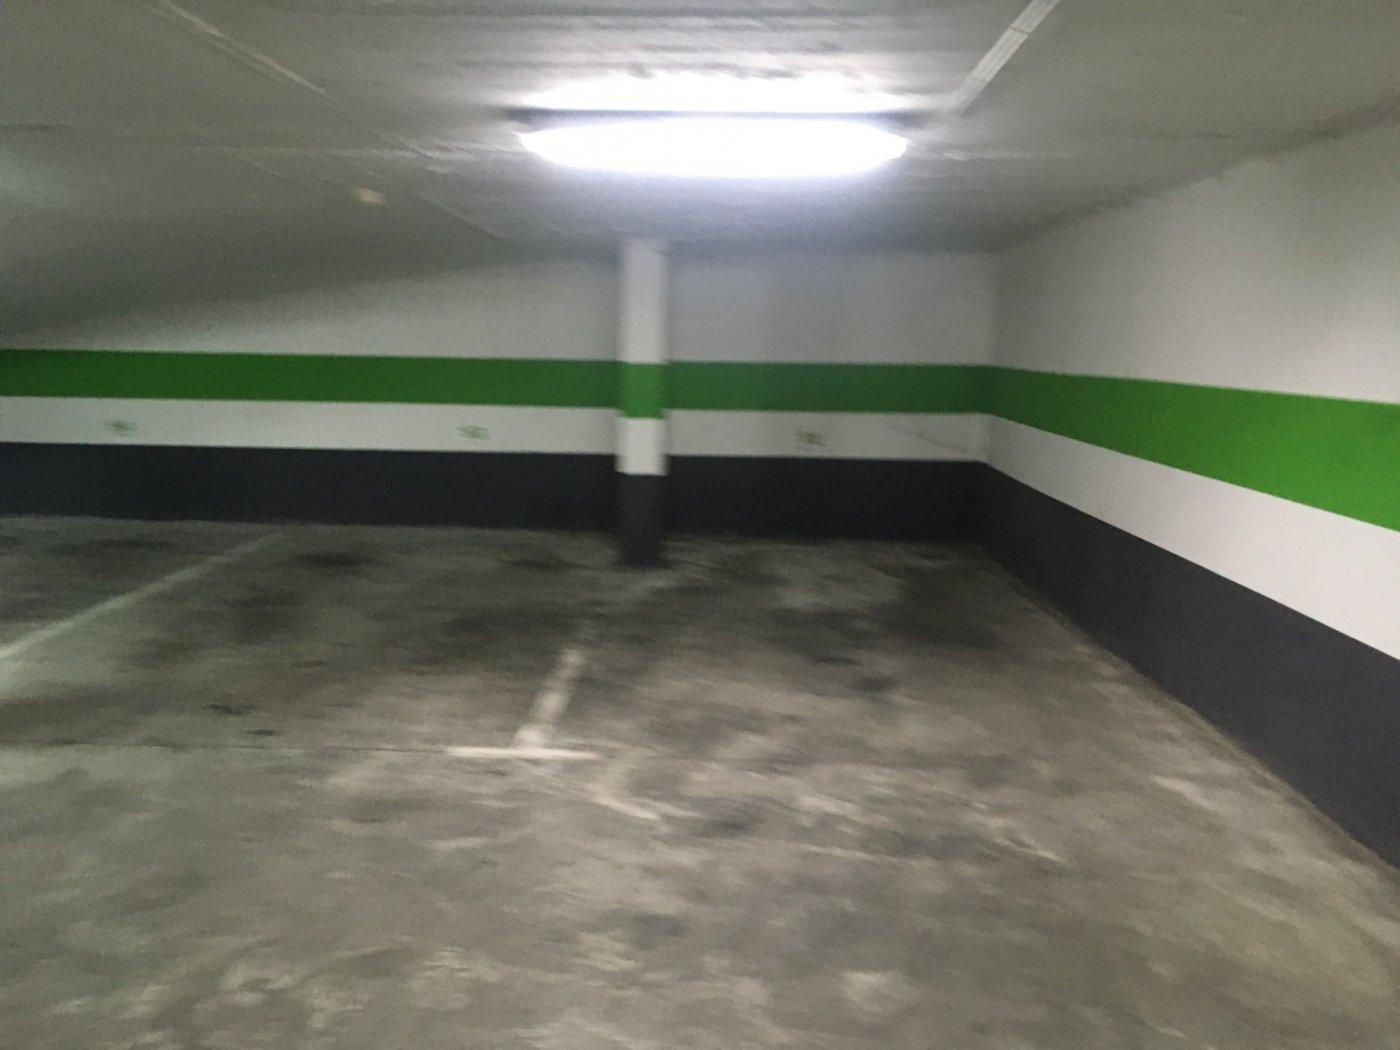 Garajes - 05-6548